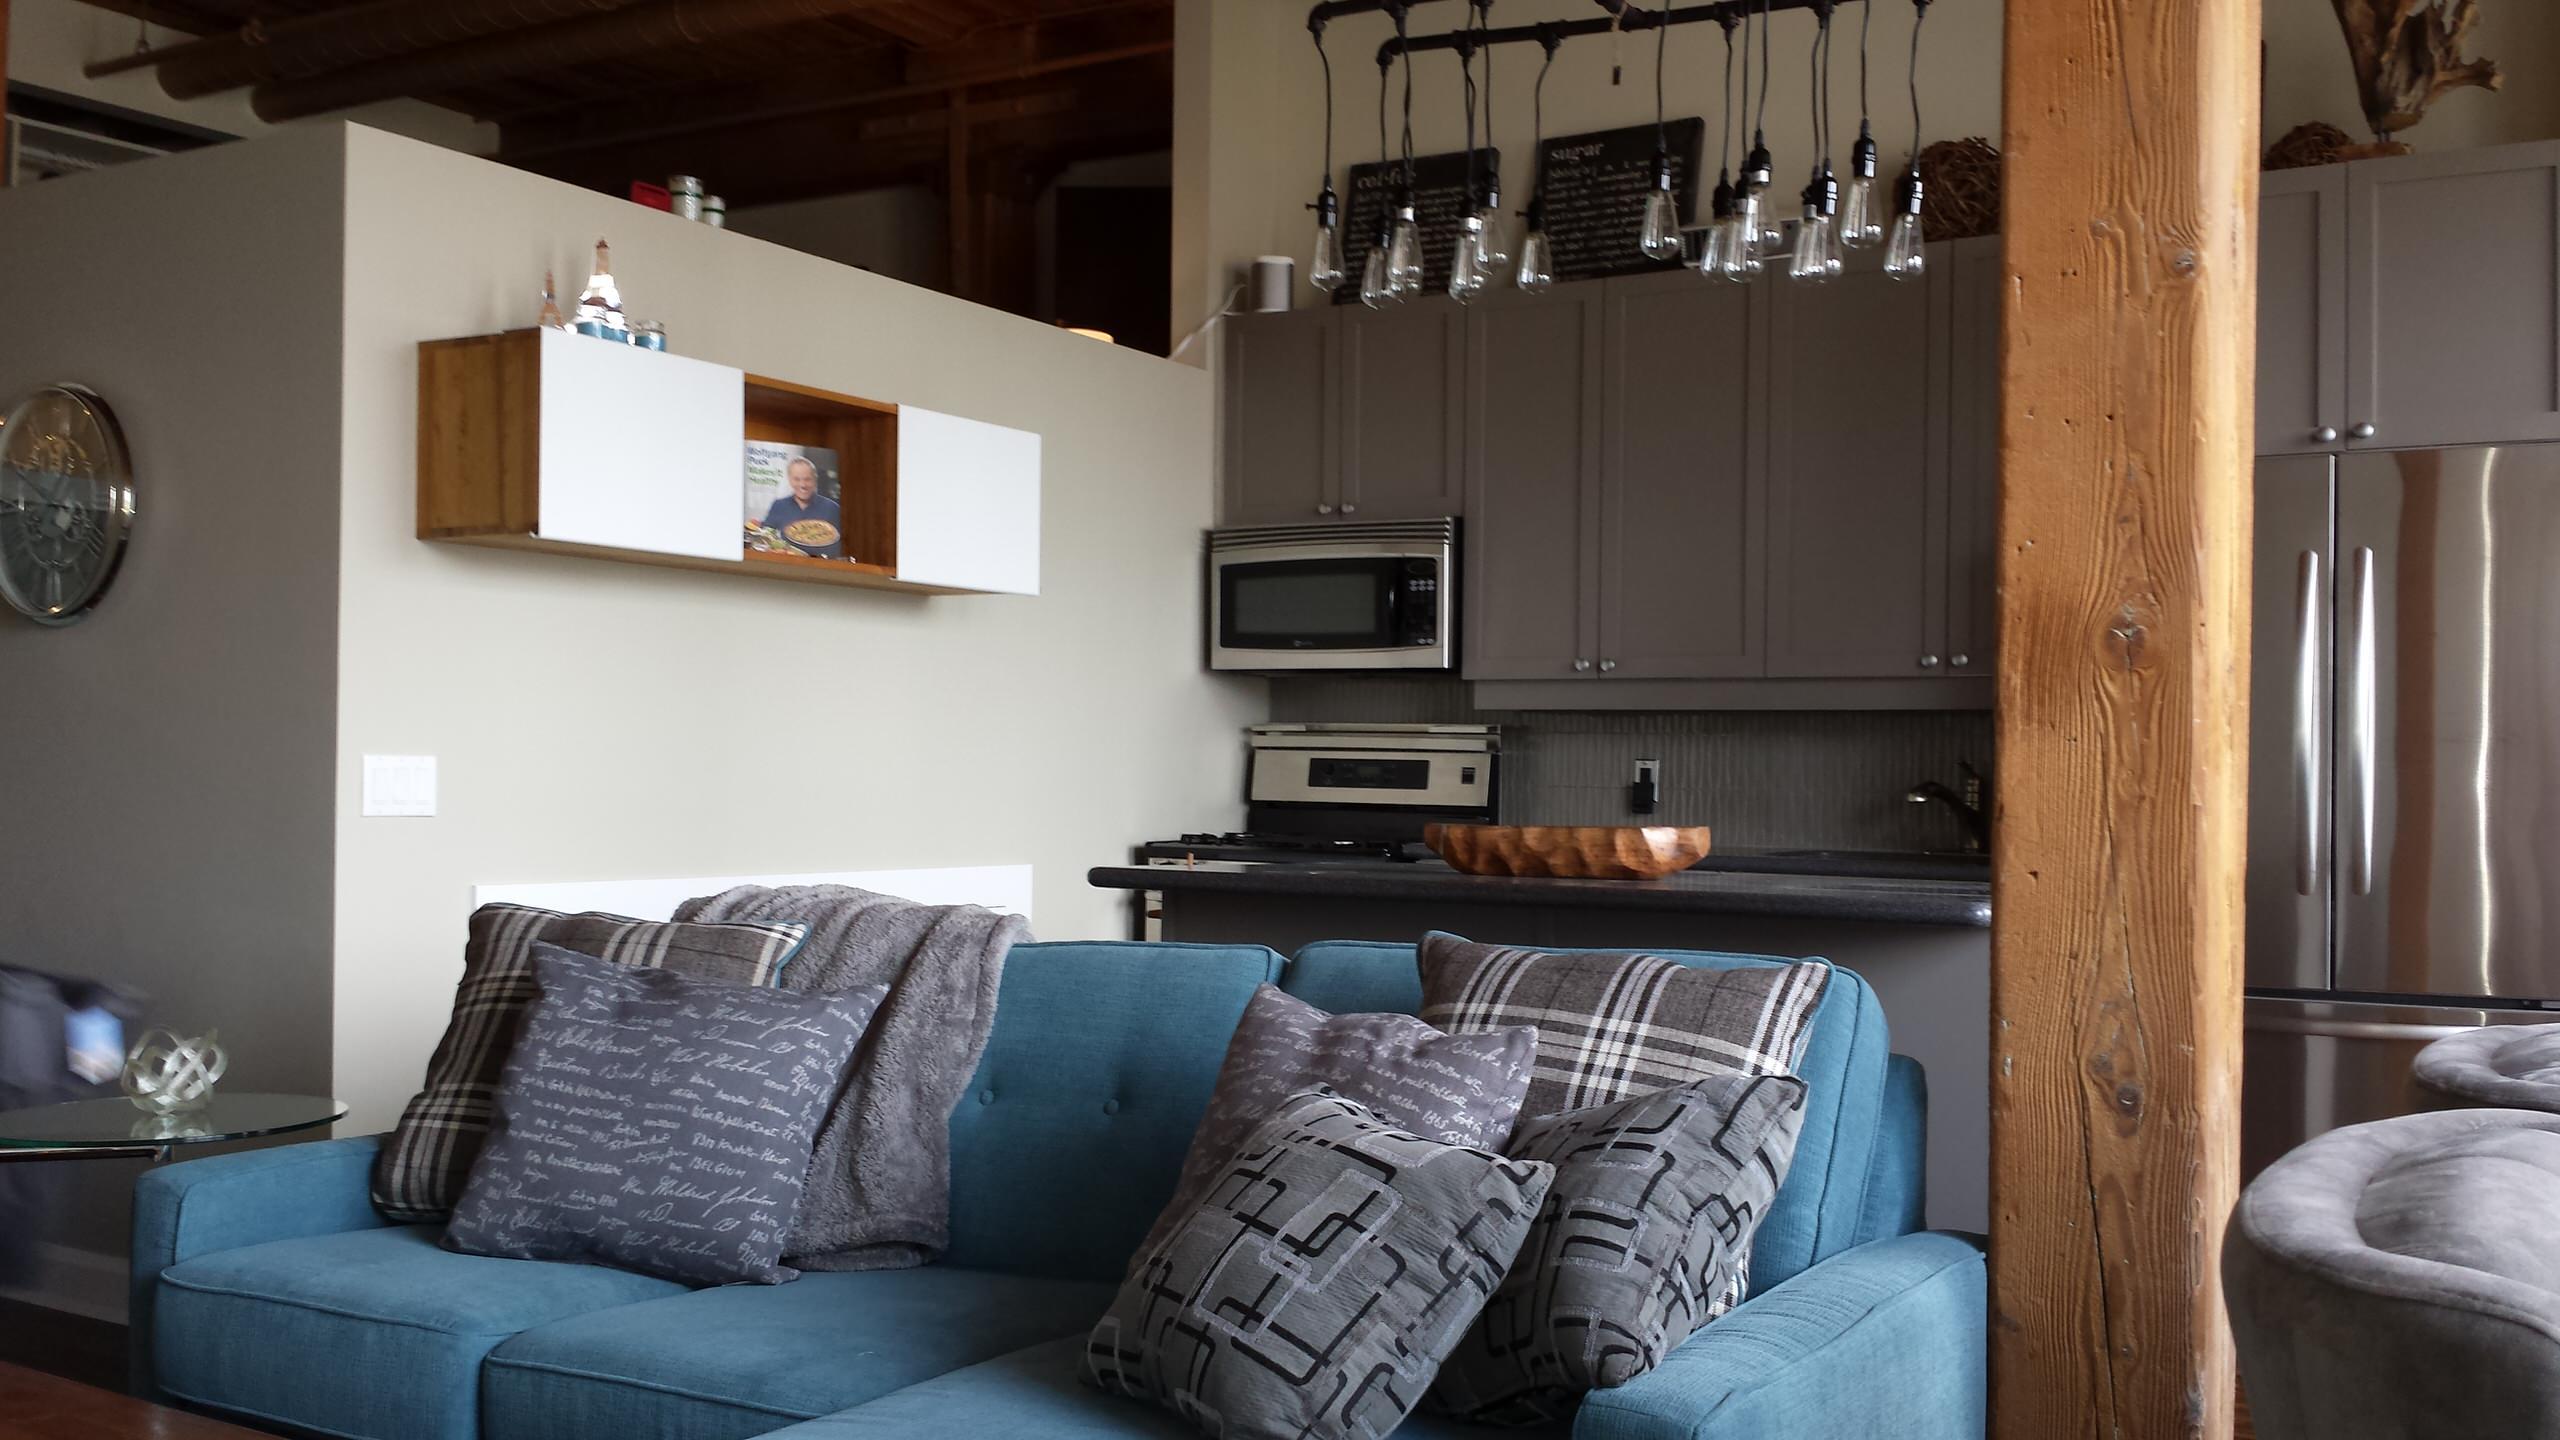 ADM Design - Candy Factory Lofts - E. Residence